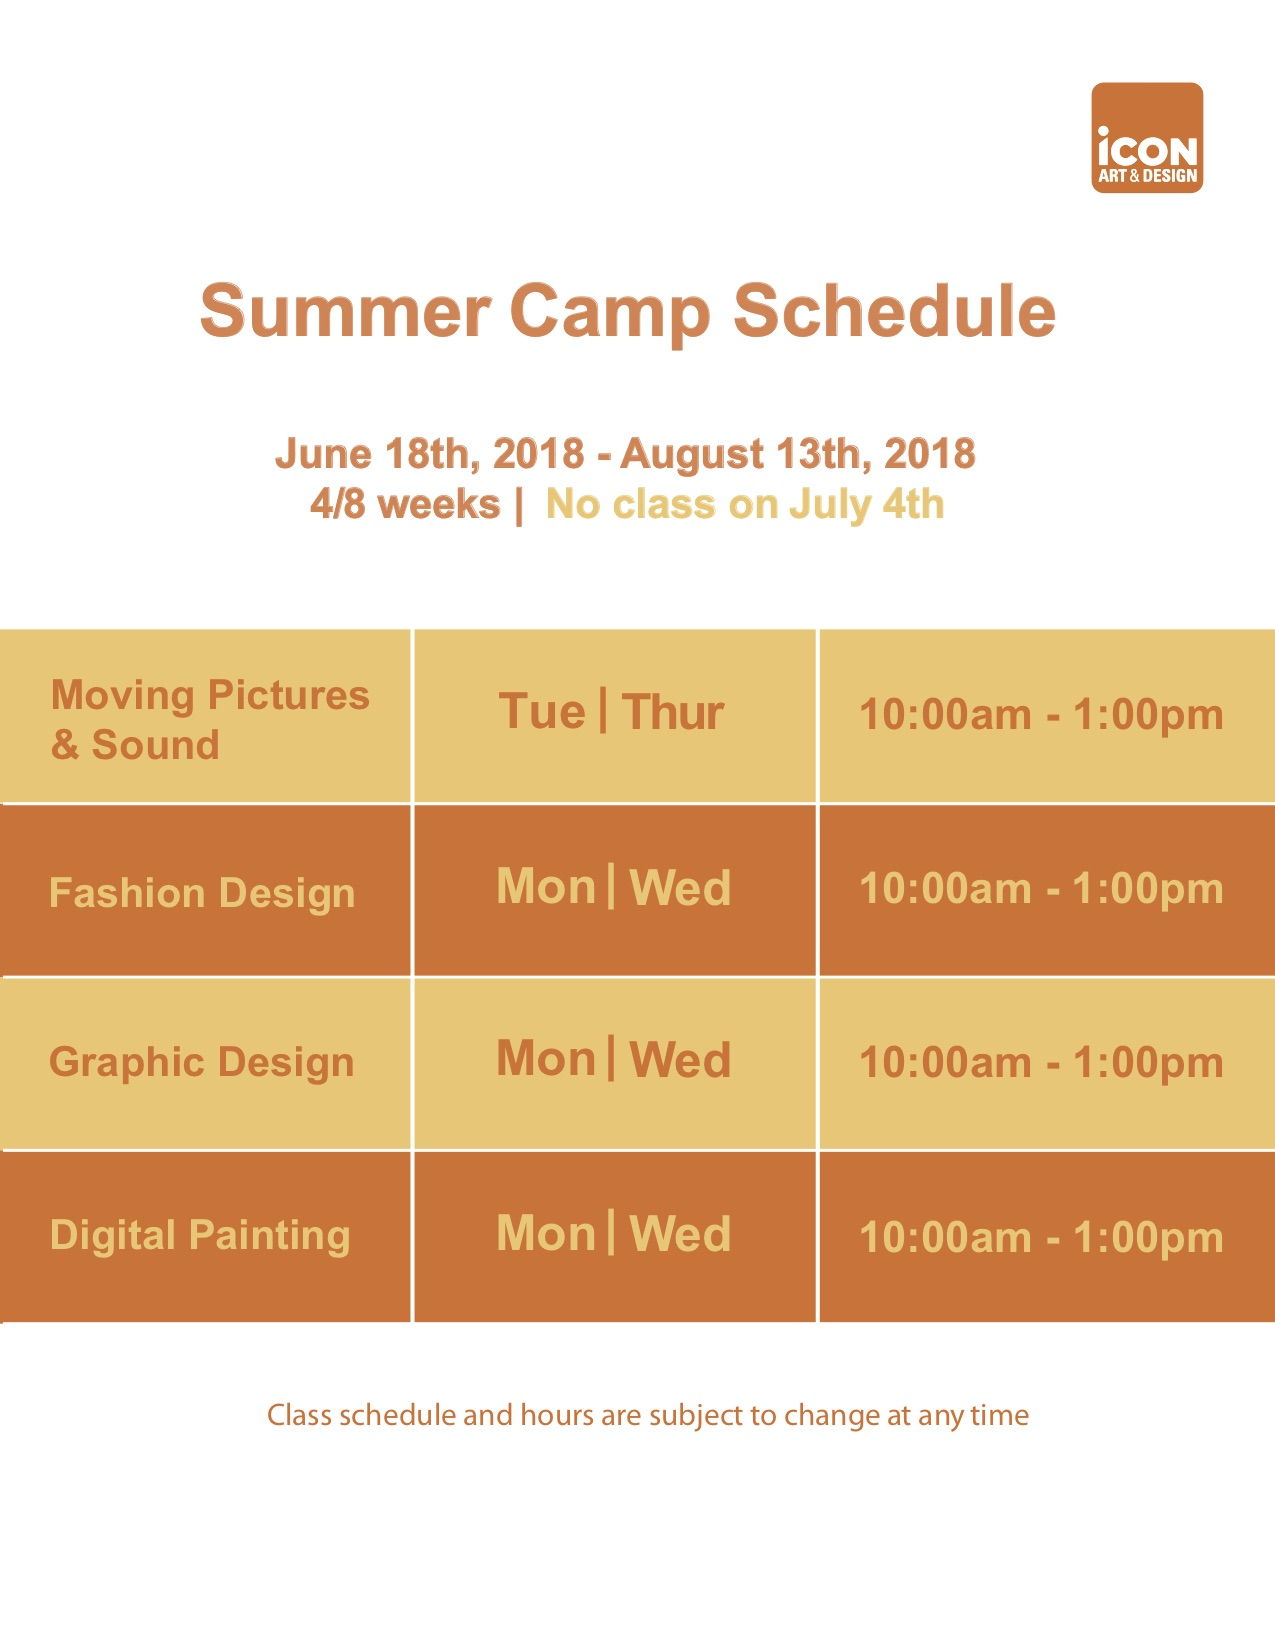 summercamp_5.jpg